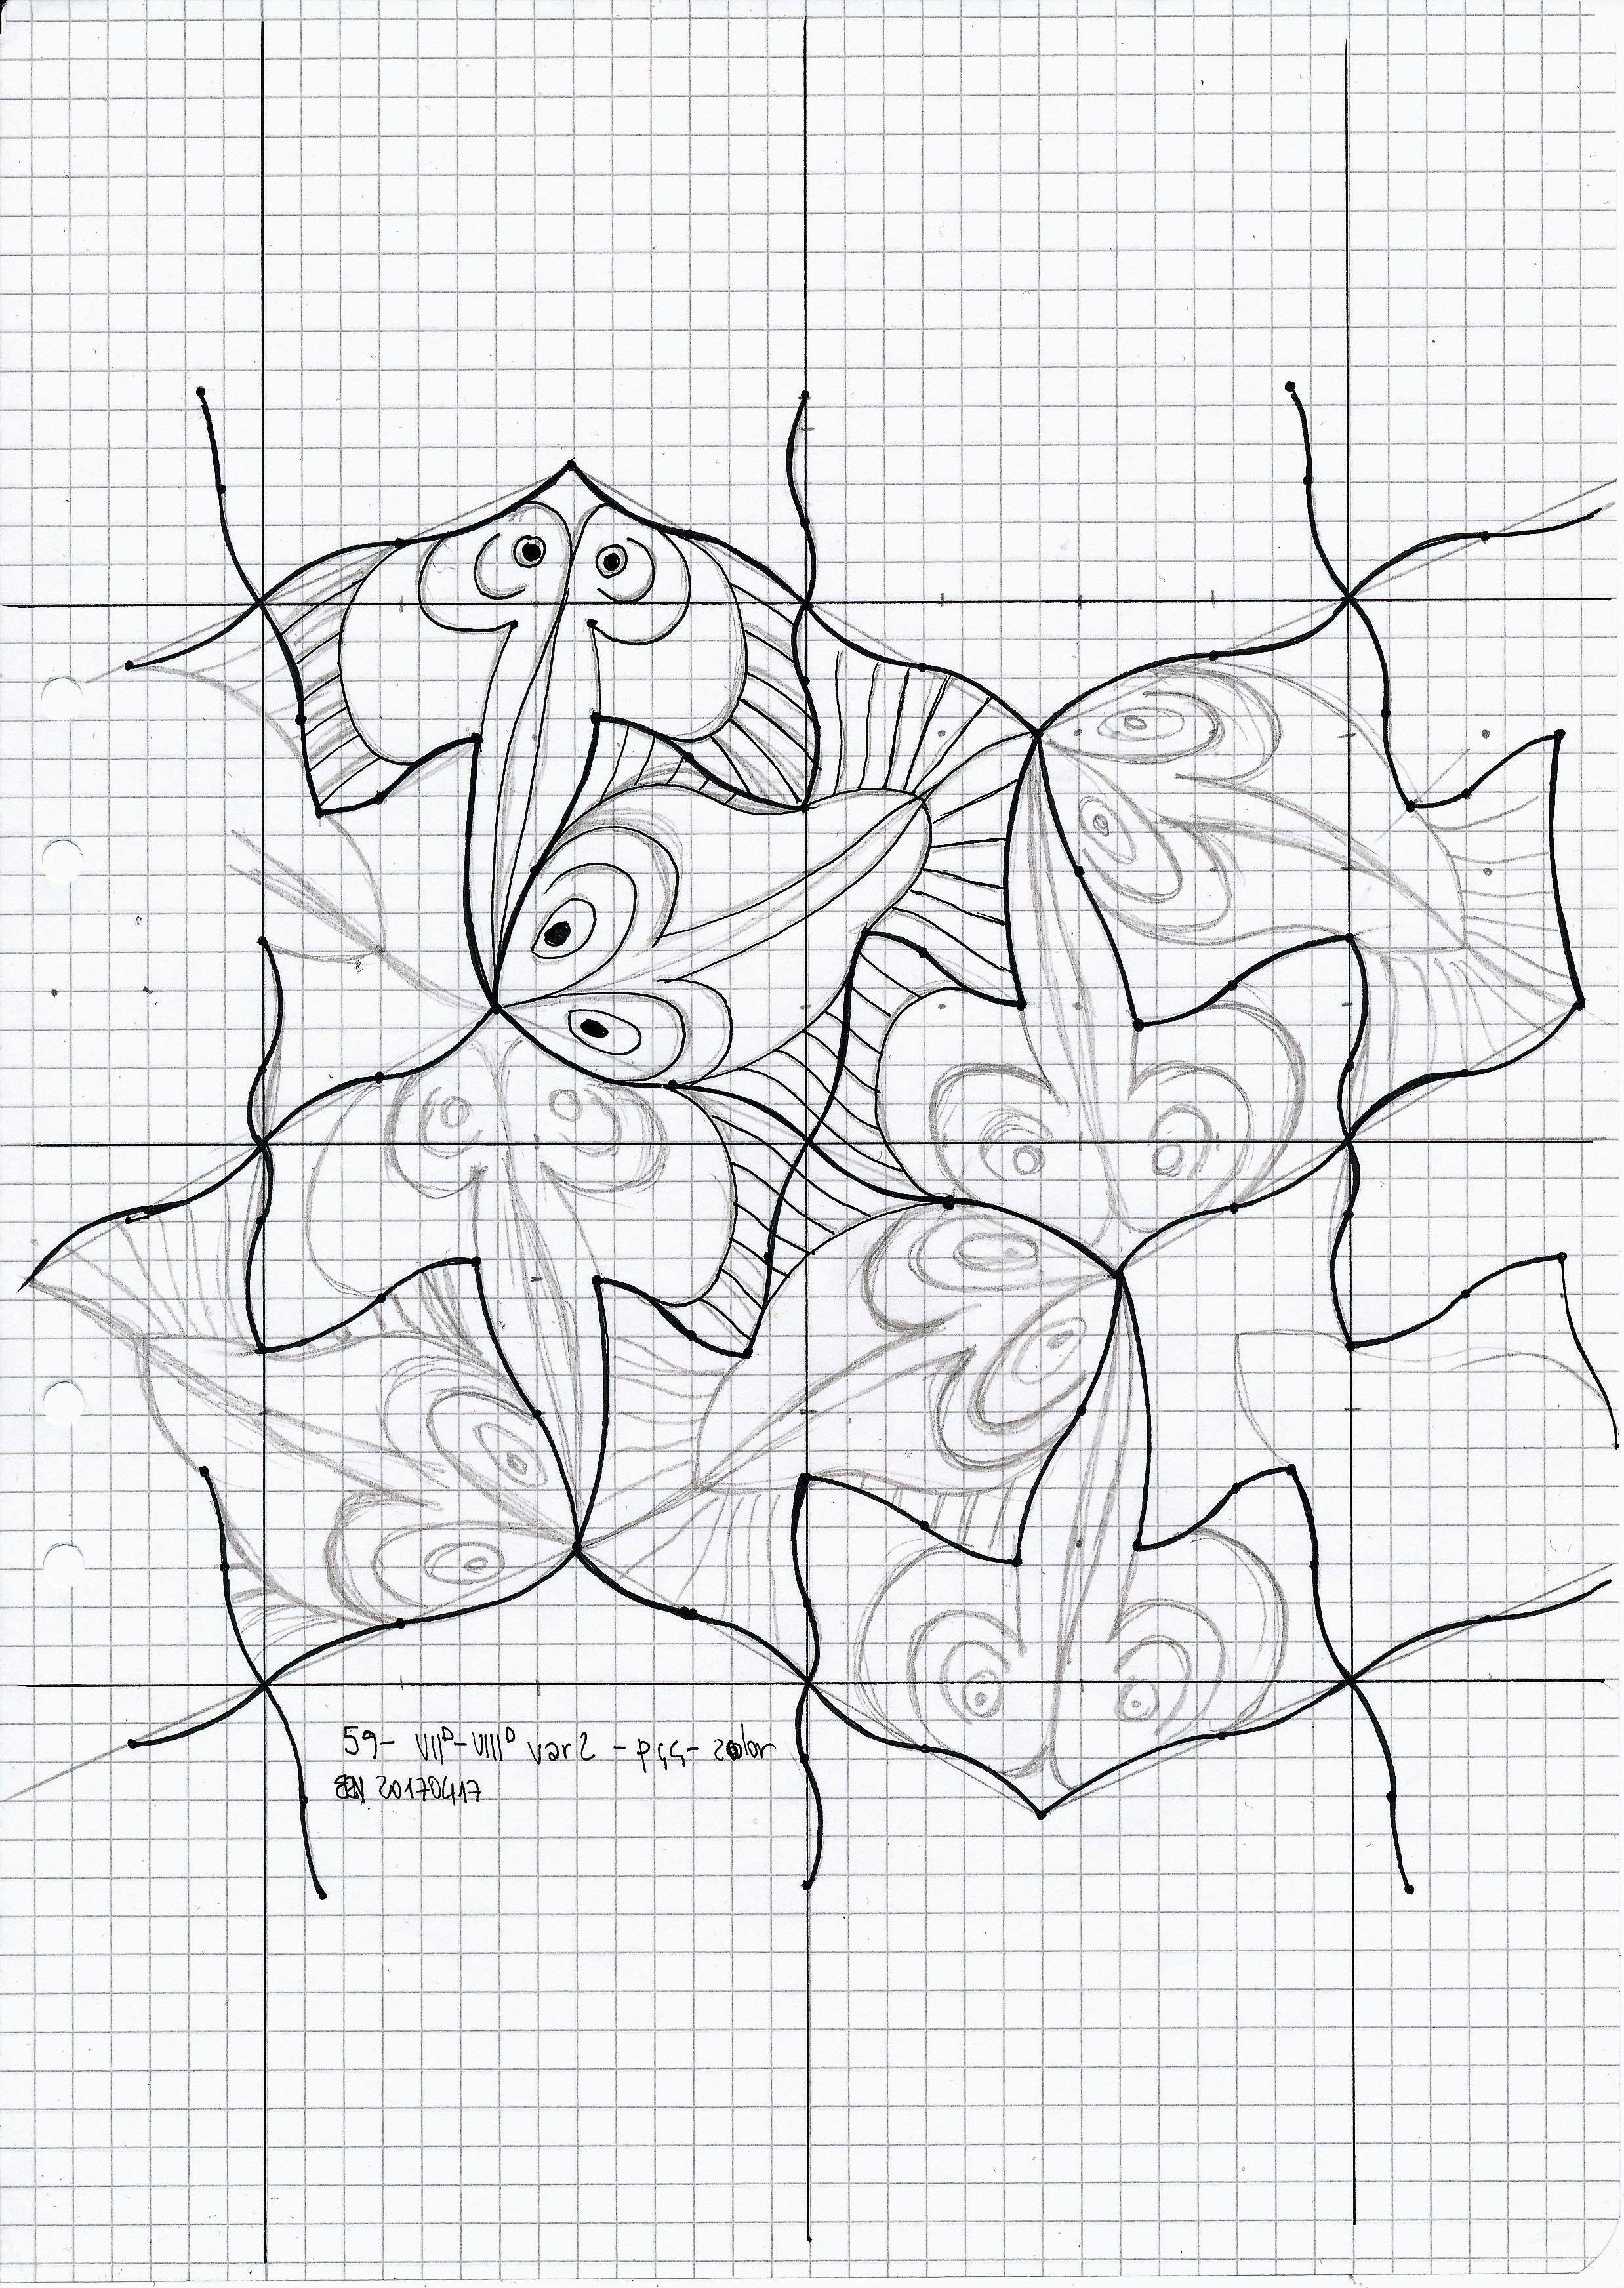 Mc Escher Nr 59 Tessellation Tiling Wallpaper Geometry Symmetry Pattern Mathart Regolo54 Handmade Wate Patrones De Diseno Patrones Como Dibujar Manos